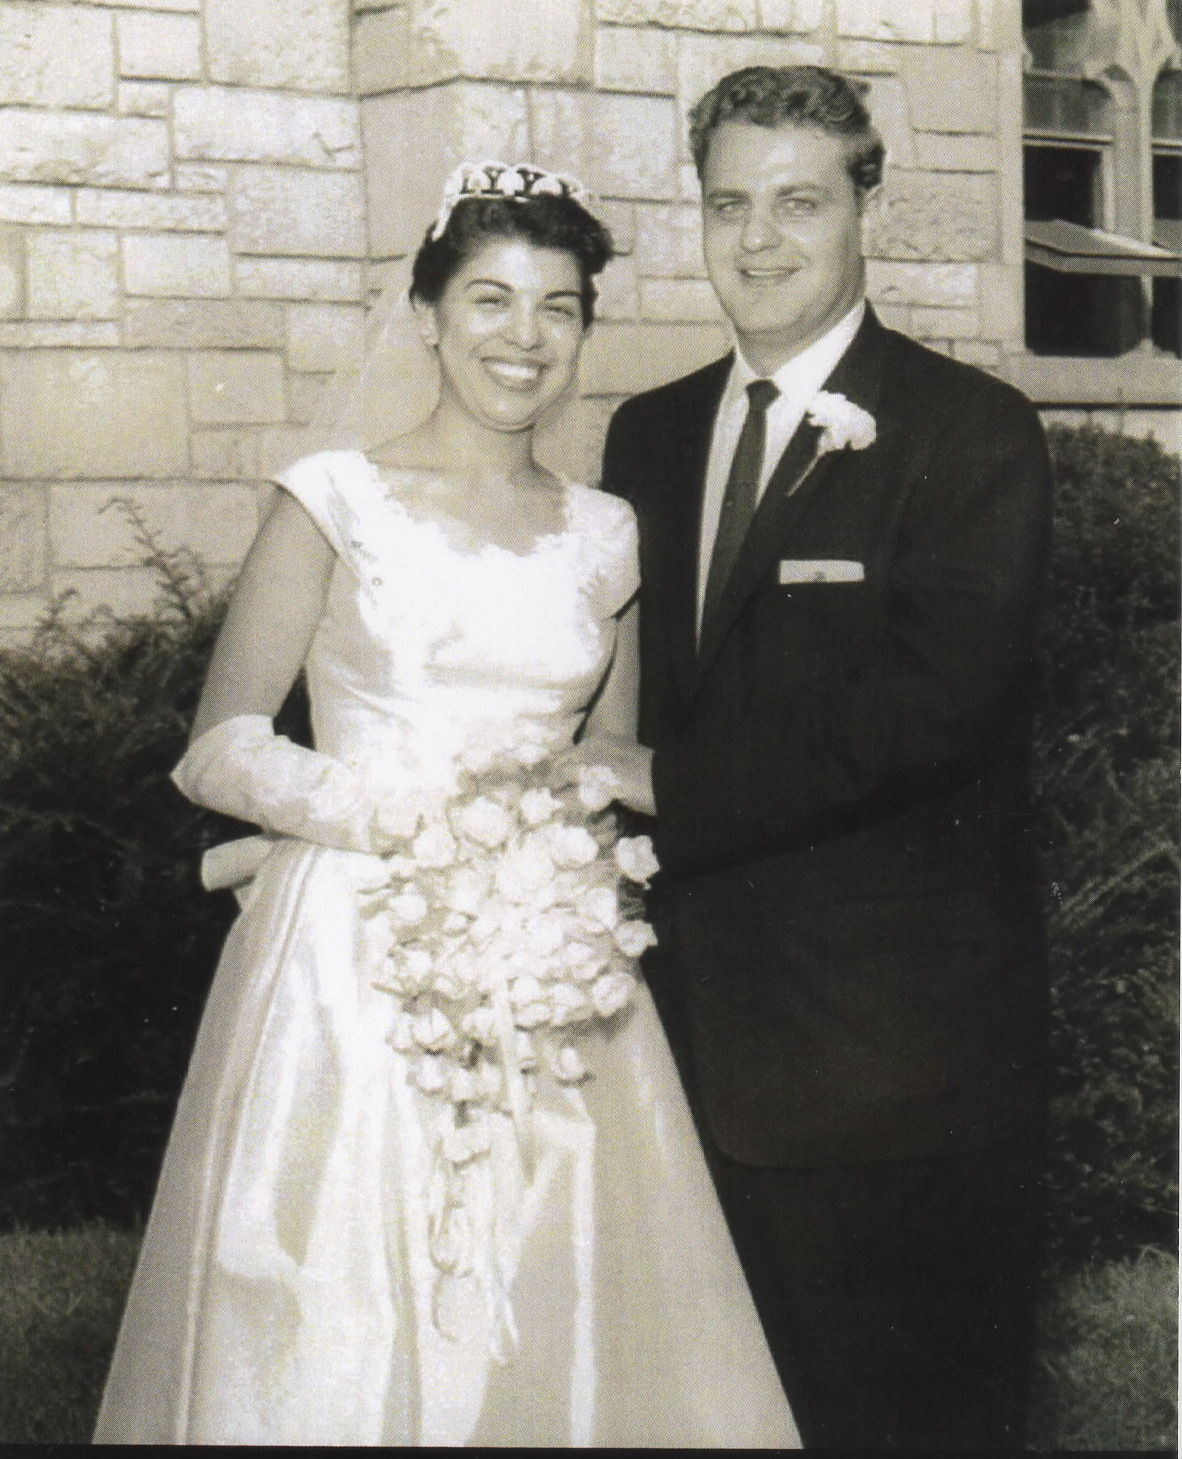 Bracich family celebrates 60 years